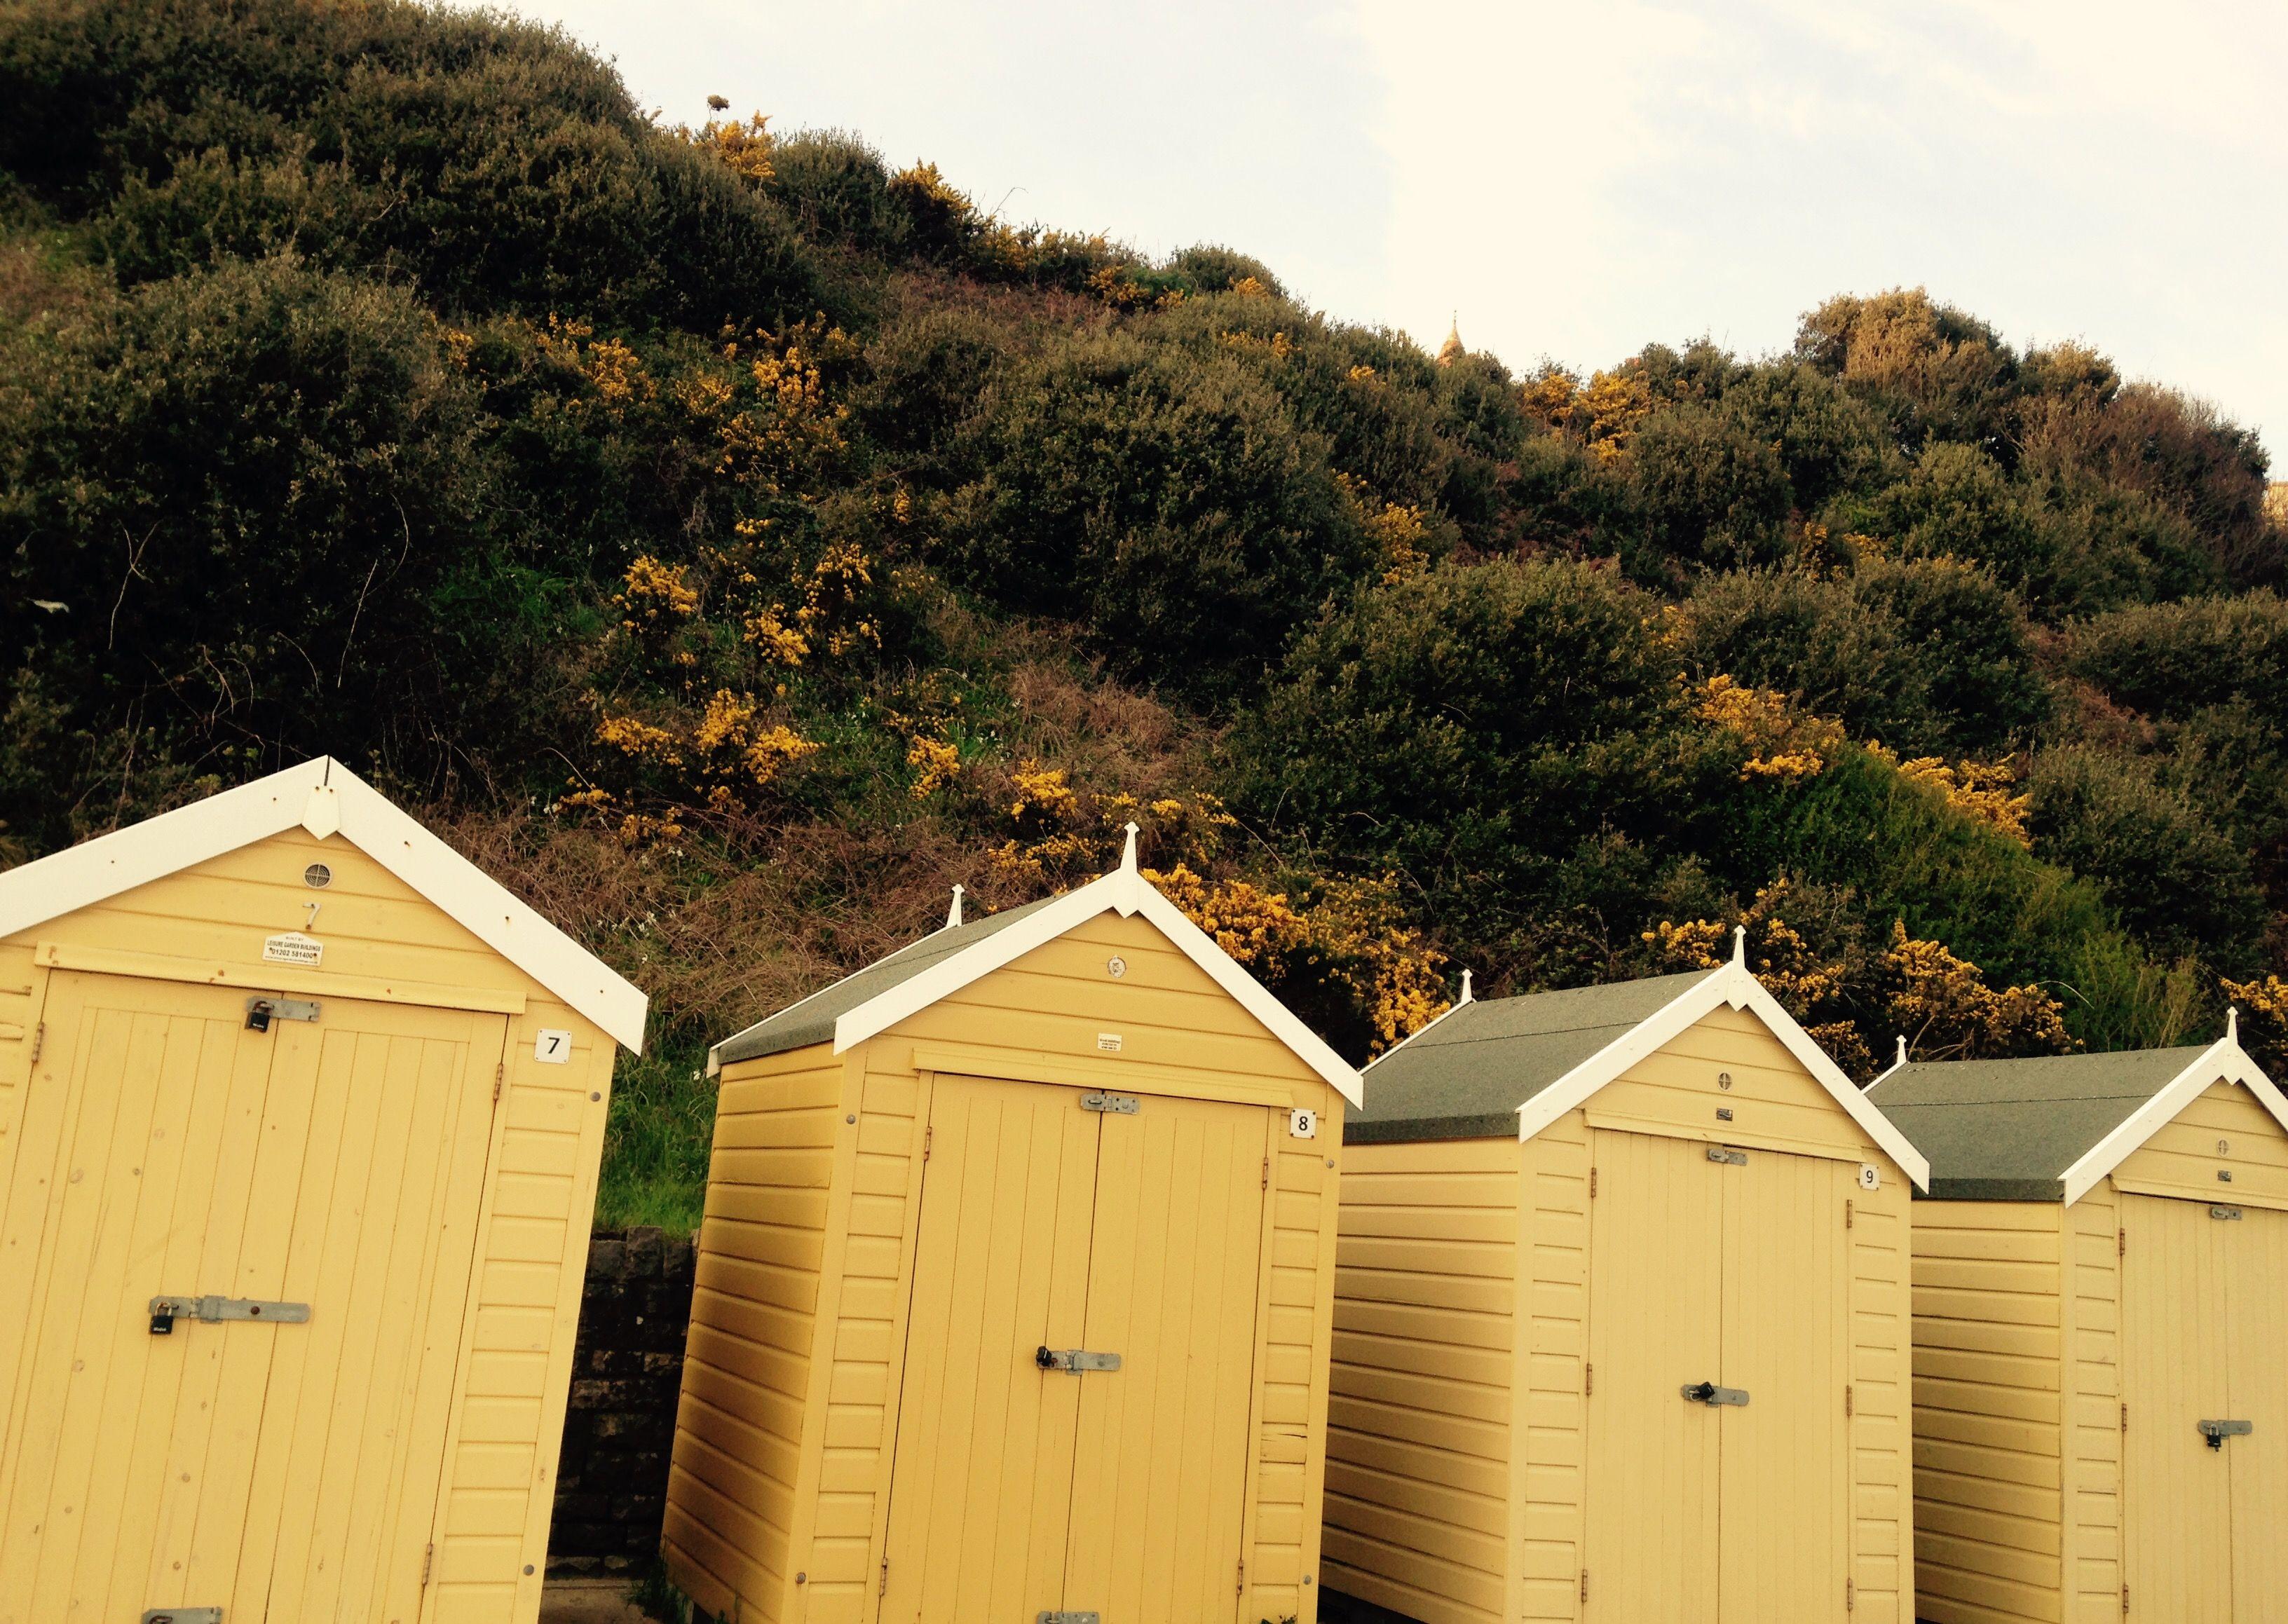 Bournemouth beach huts Mar 17